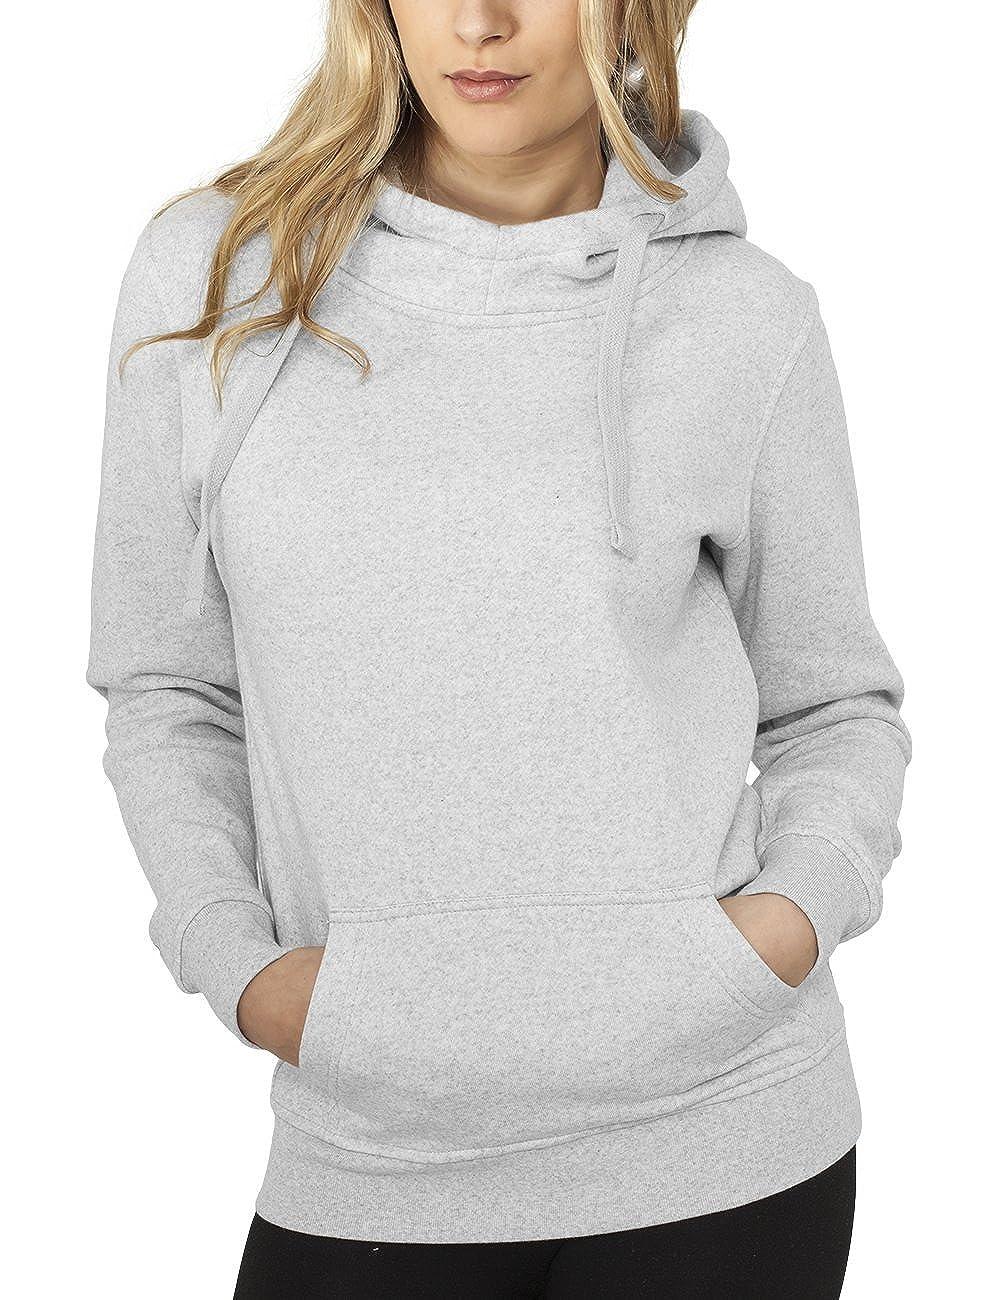 TALLA XL. Urban Classics Bekleidung Ladies Melange Hoody Sudadera para Mujer